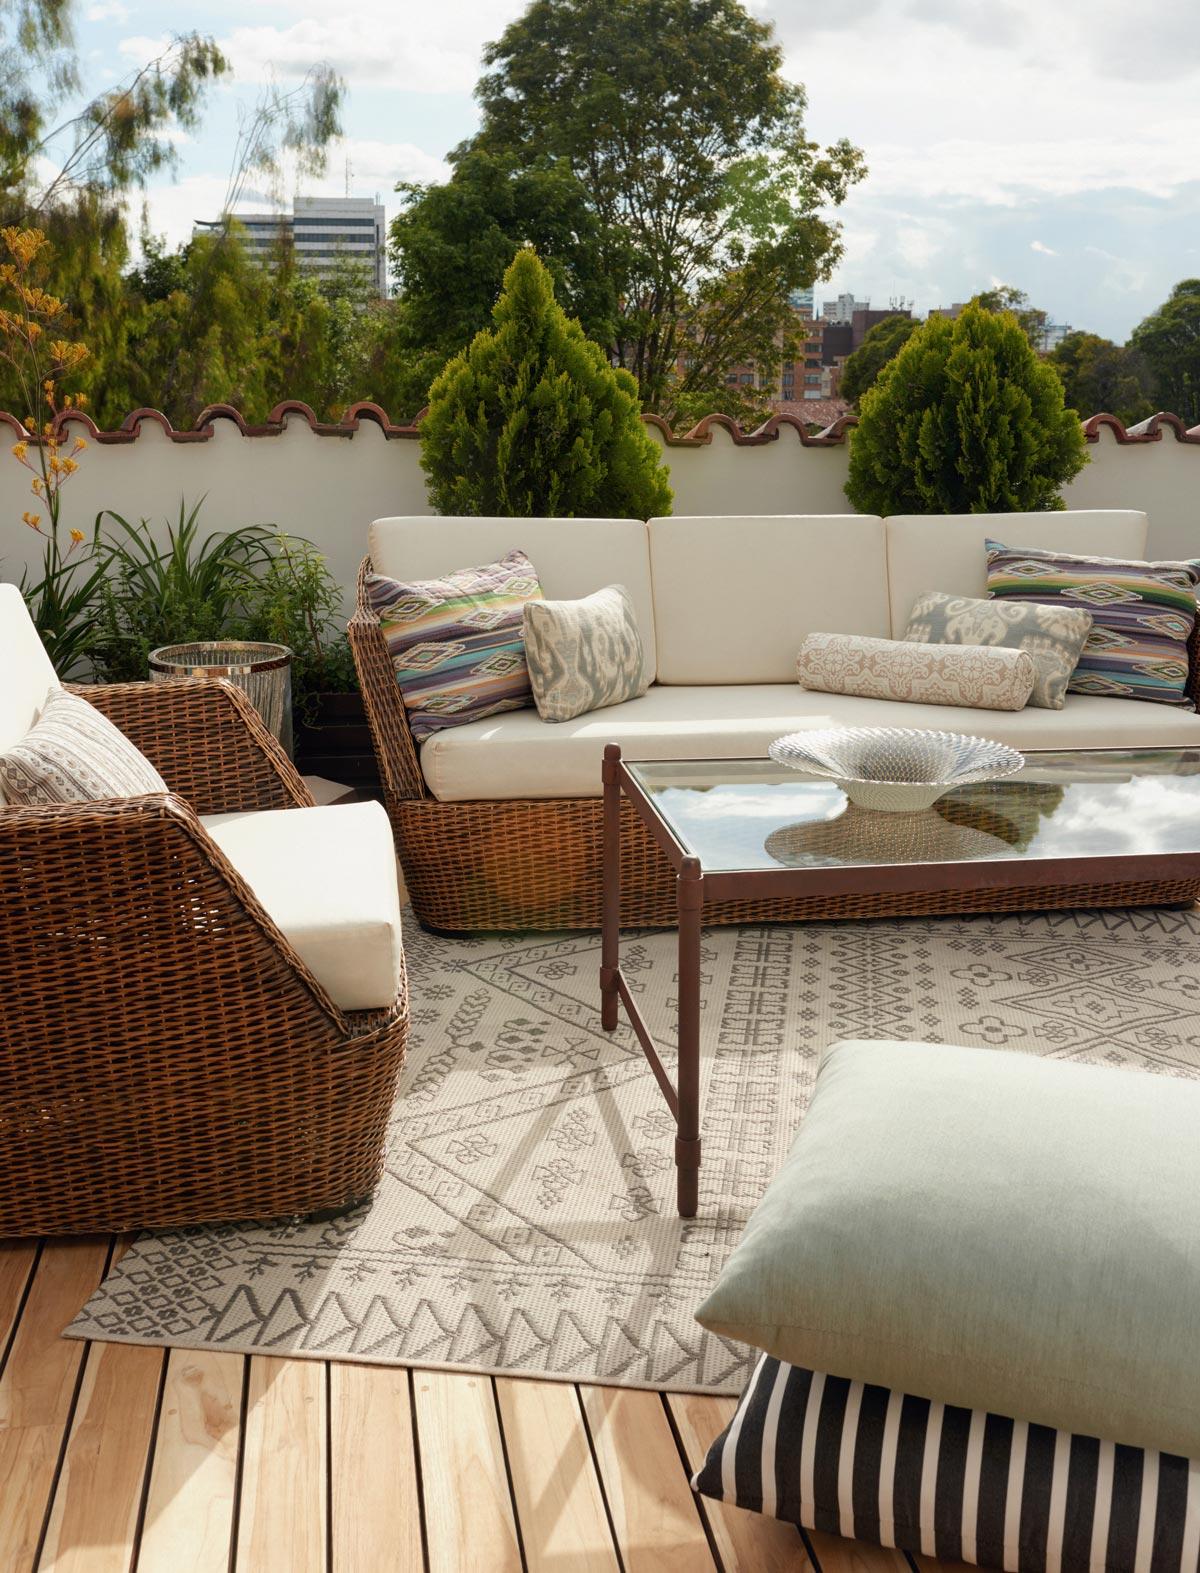 Penthouse Apartment, Bogota, Colombia, Veronica Mishaan